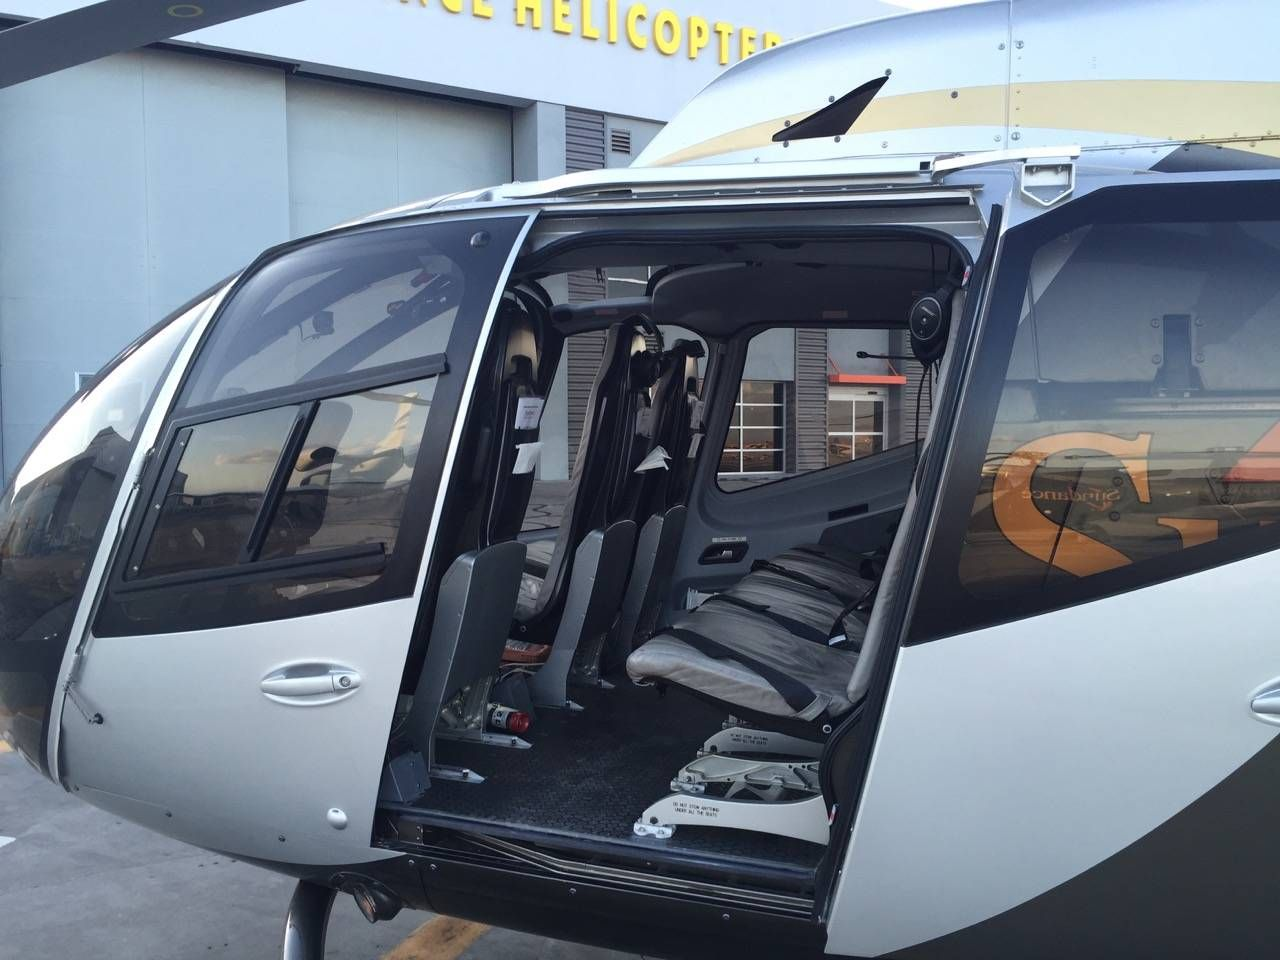 Sundance Helicopter Vegas-010